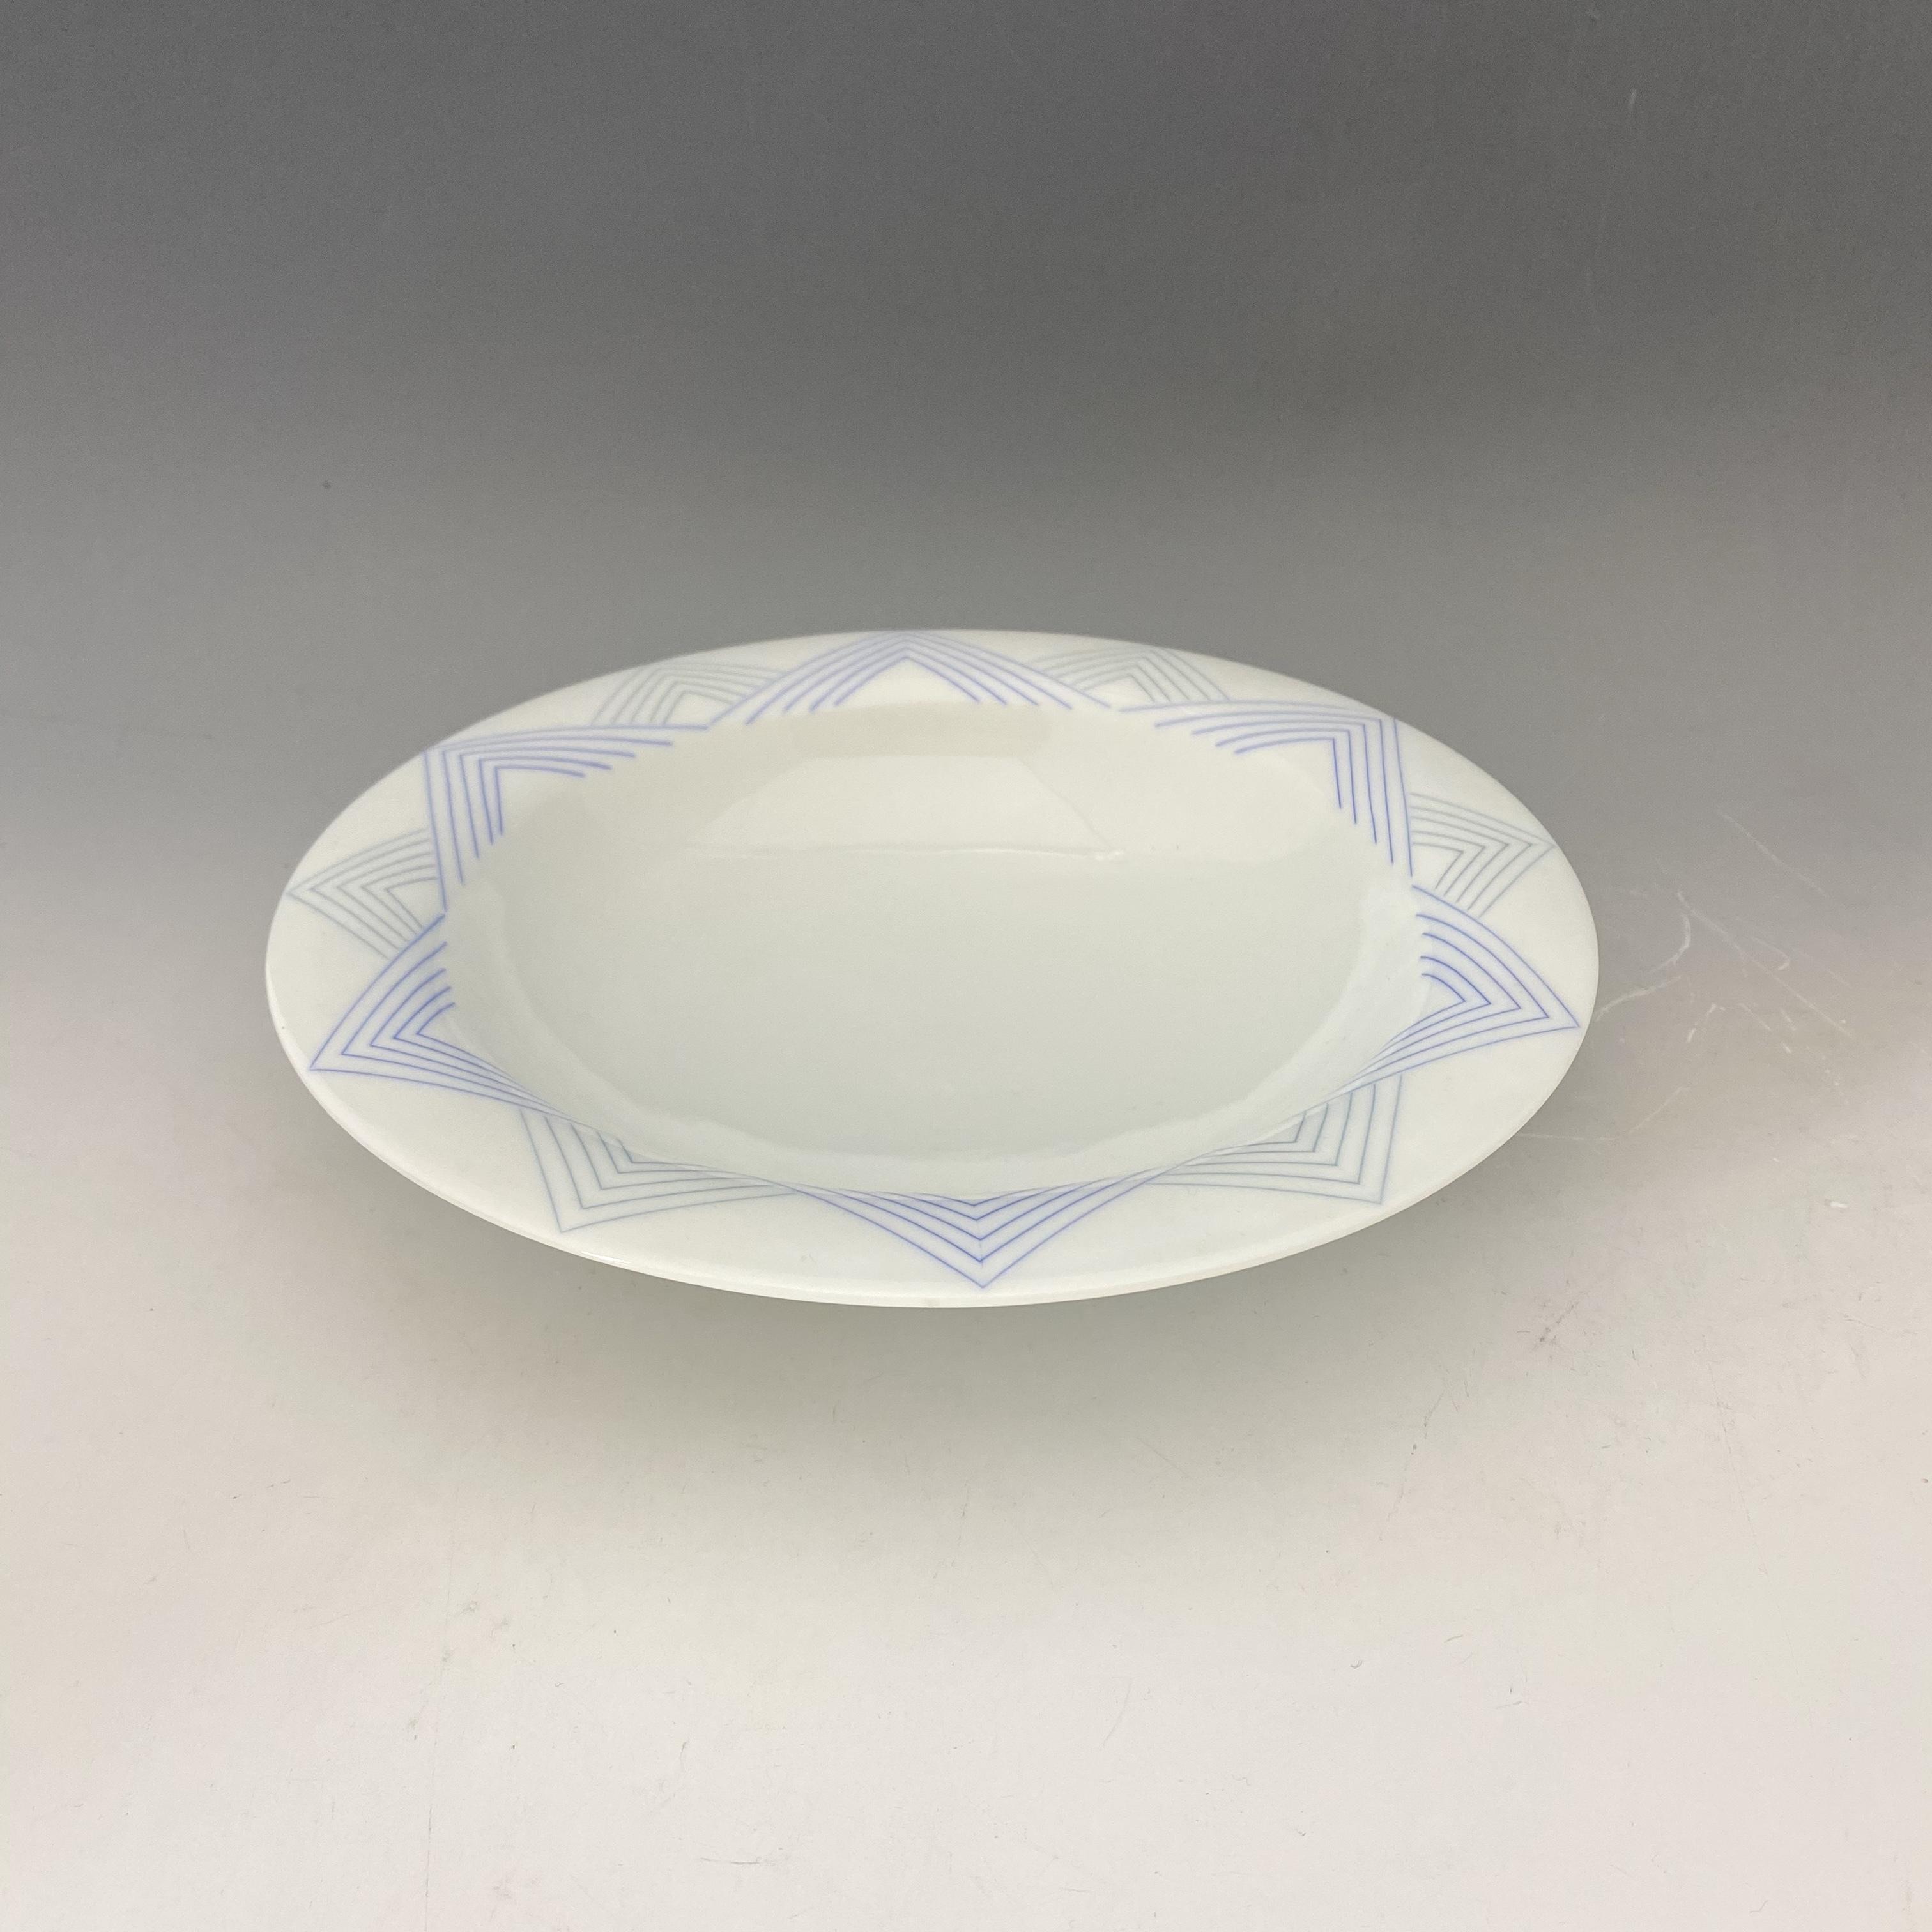 【中尾恭純】彩色象嵌カレー皿